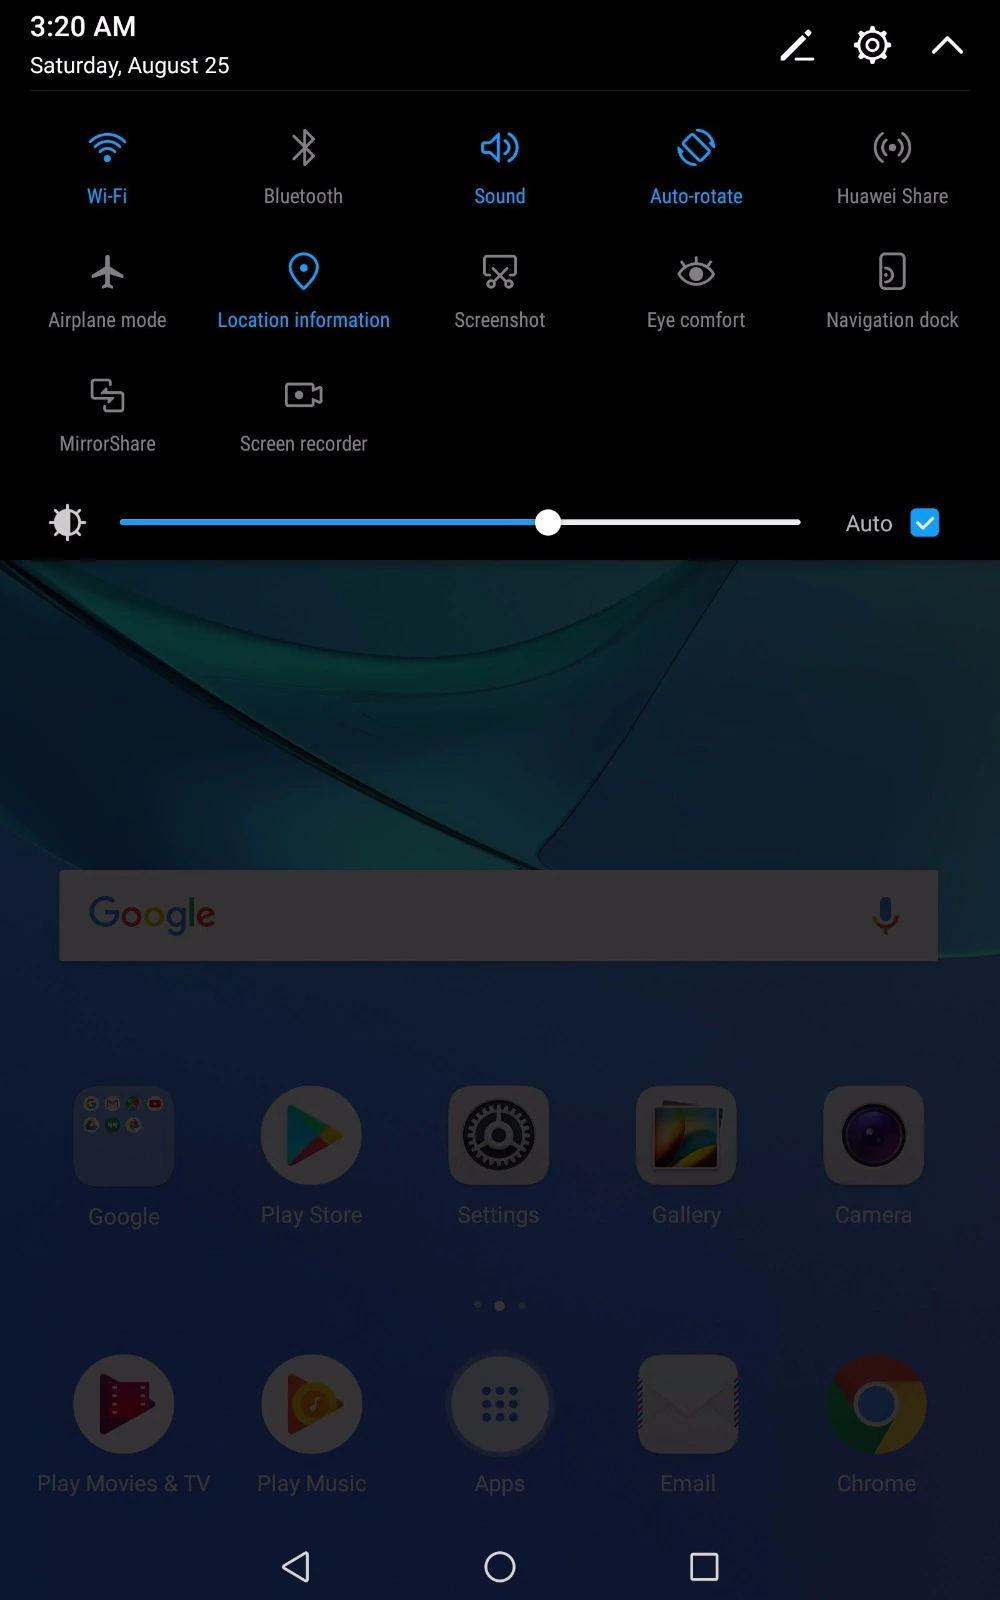 buy huawei m6 lte wifi tablet 2019